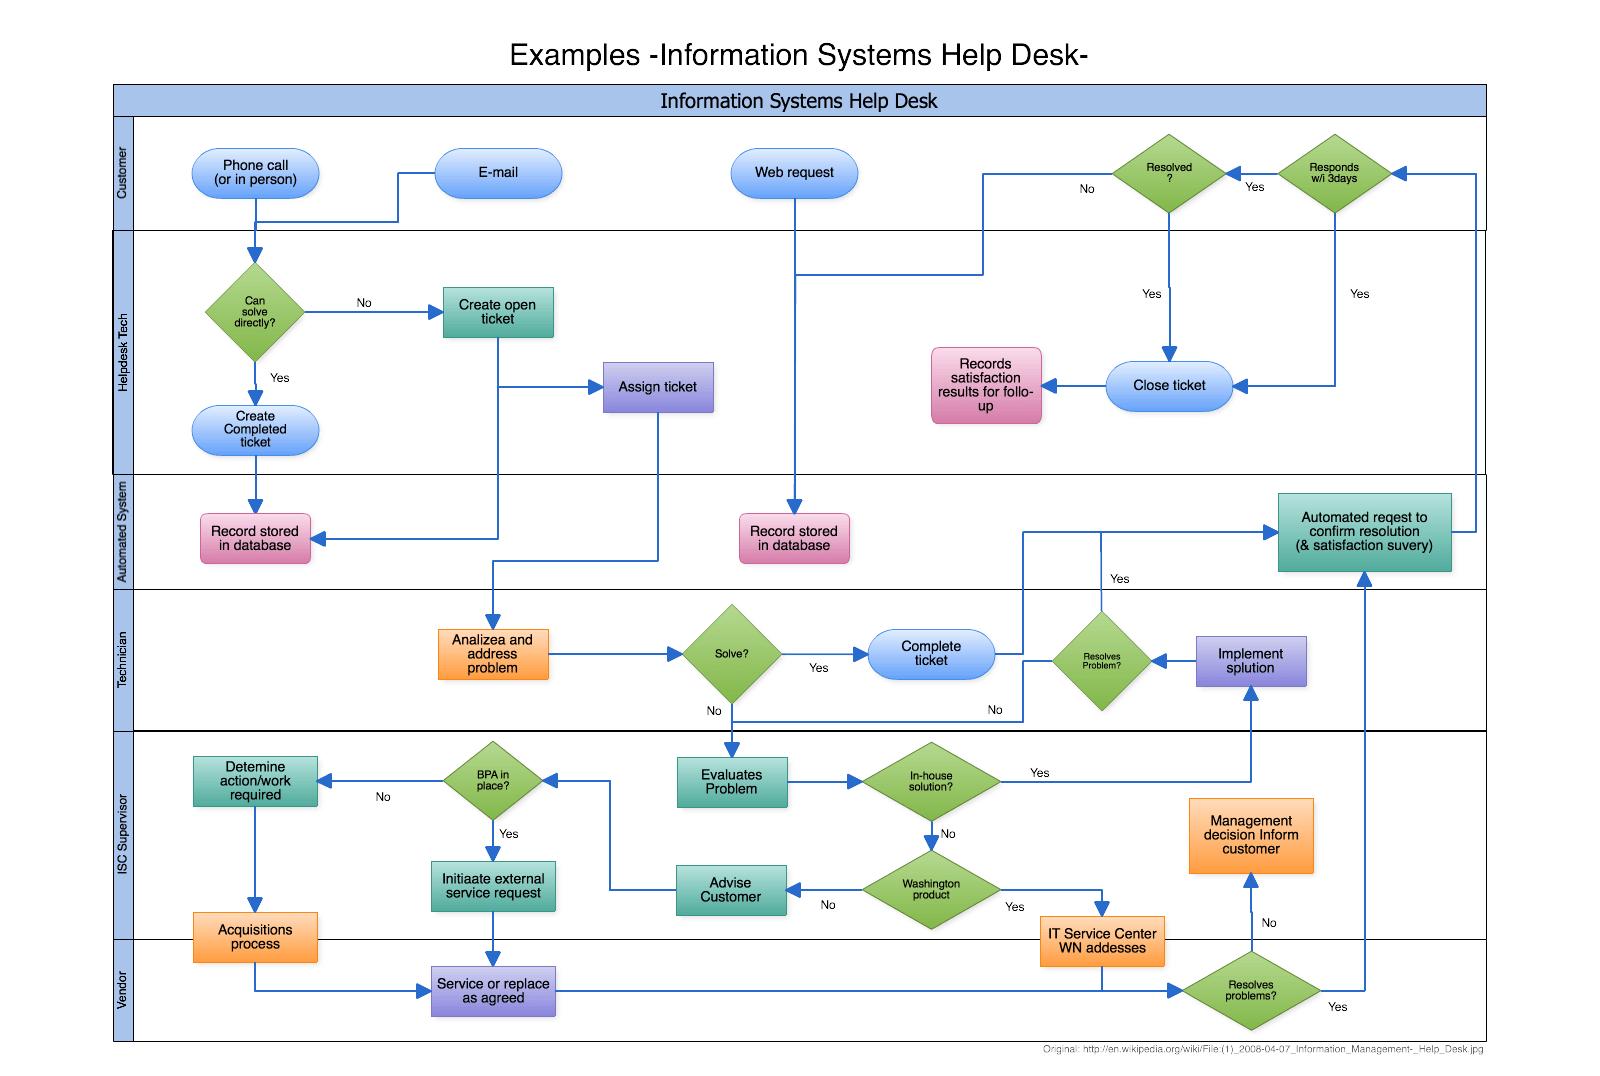 visio integration diagram visio free engine image for user manual download. Black Bedroom Furniture Sets. Home Design Ideas